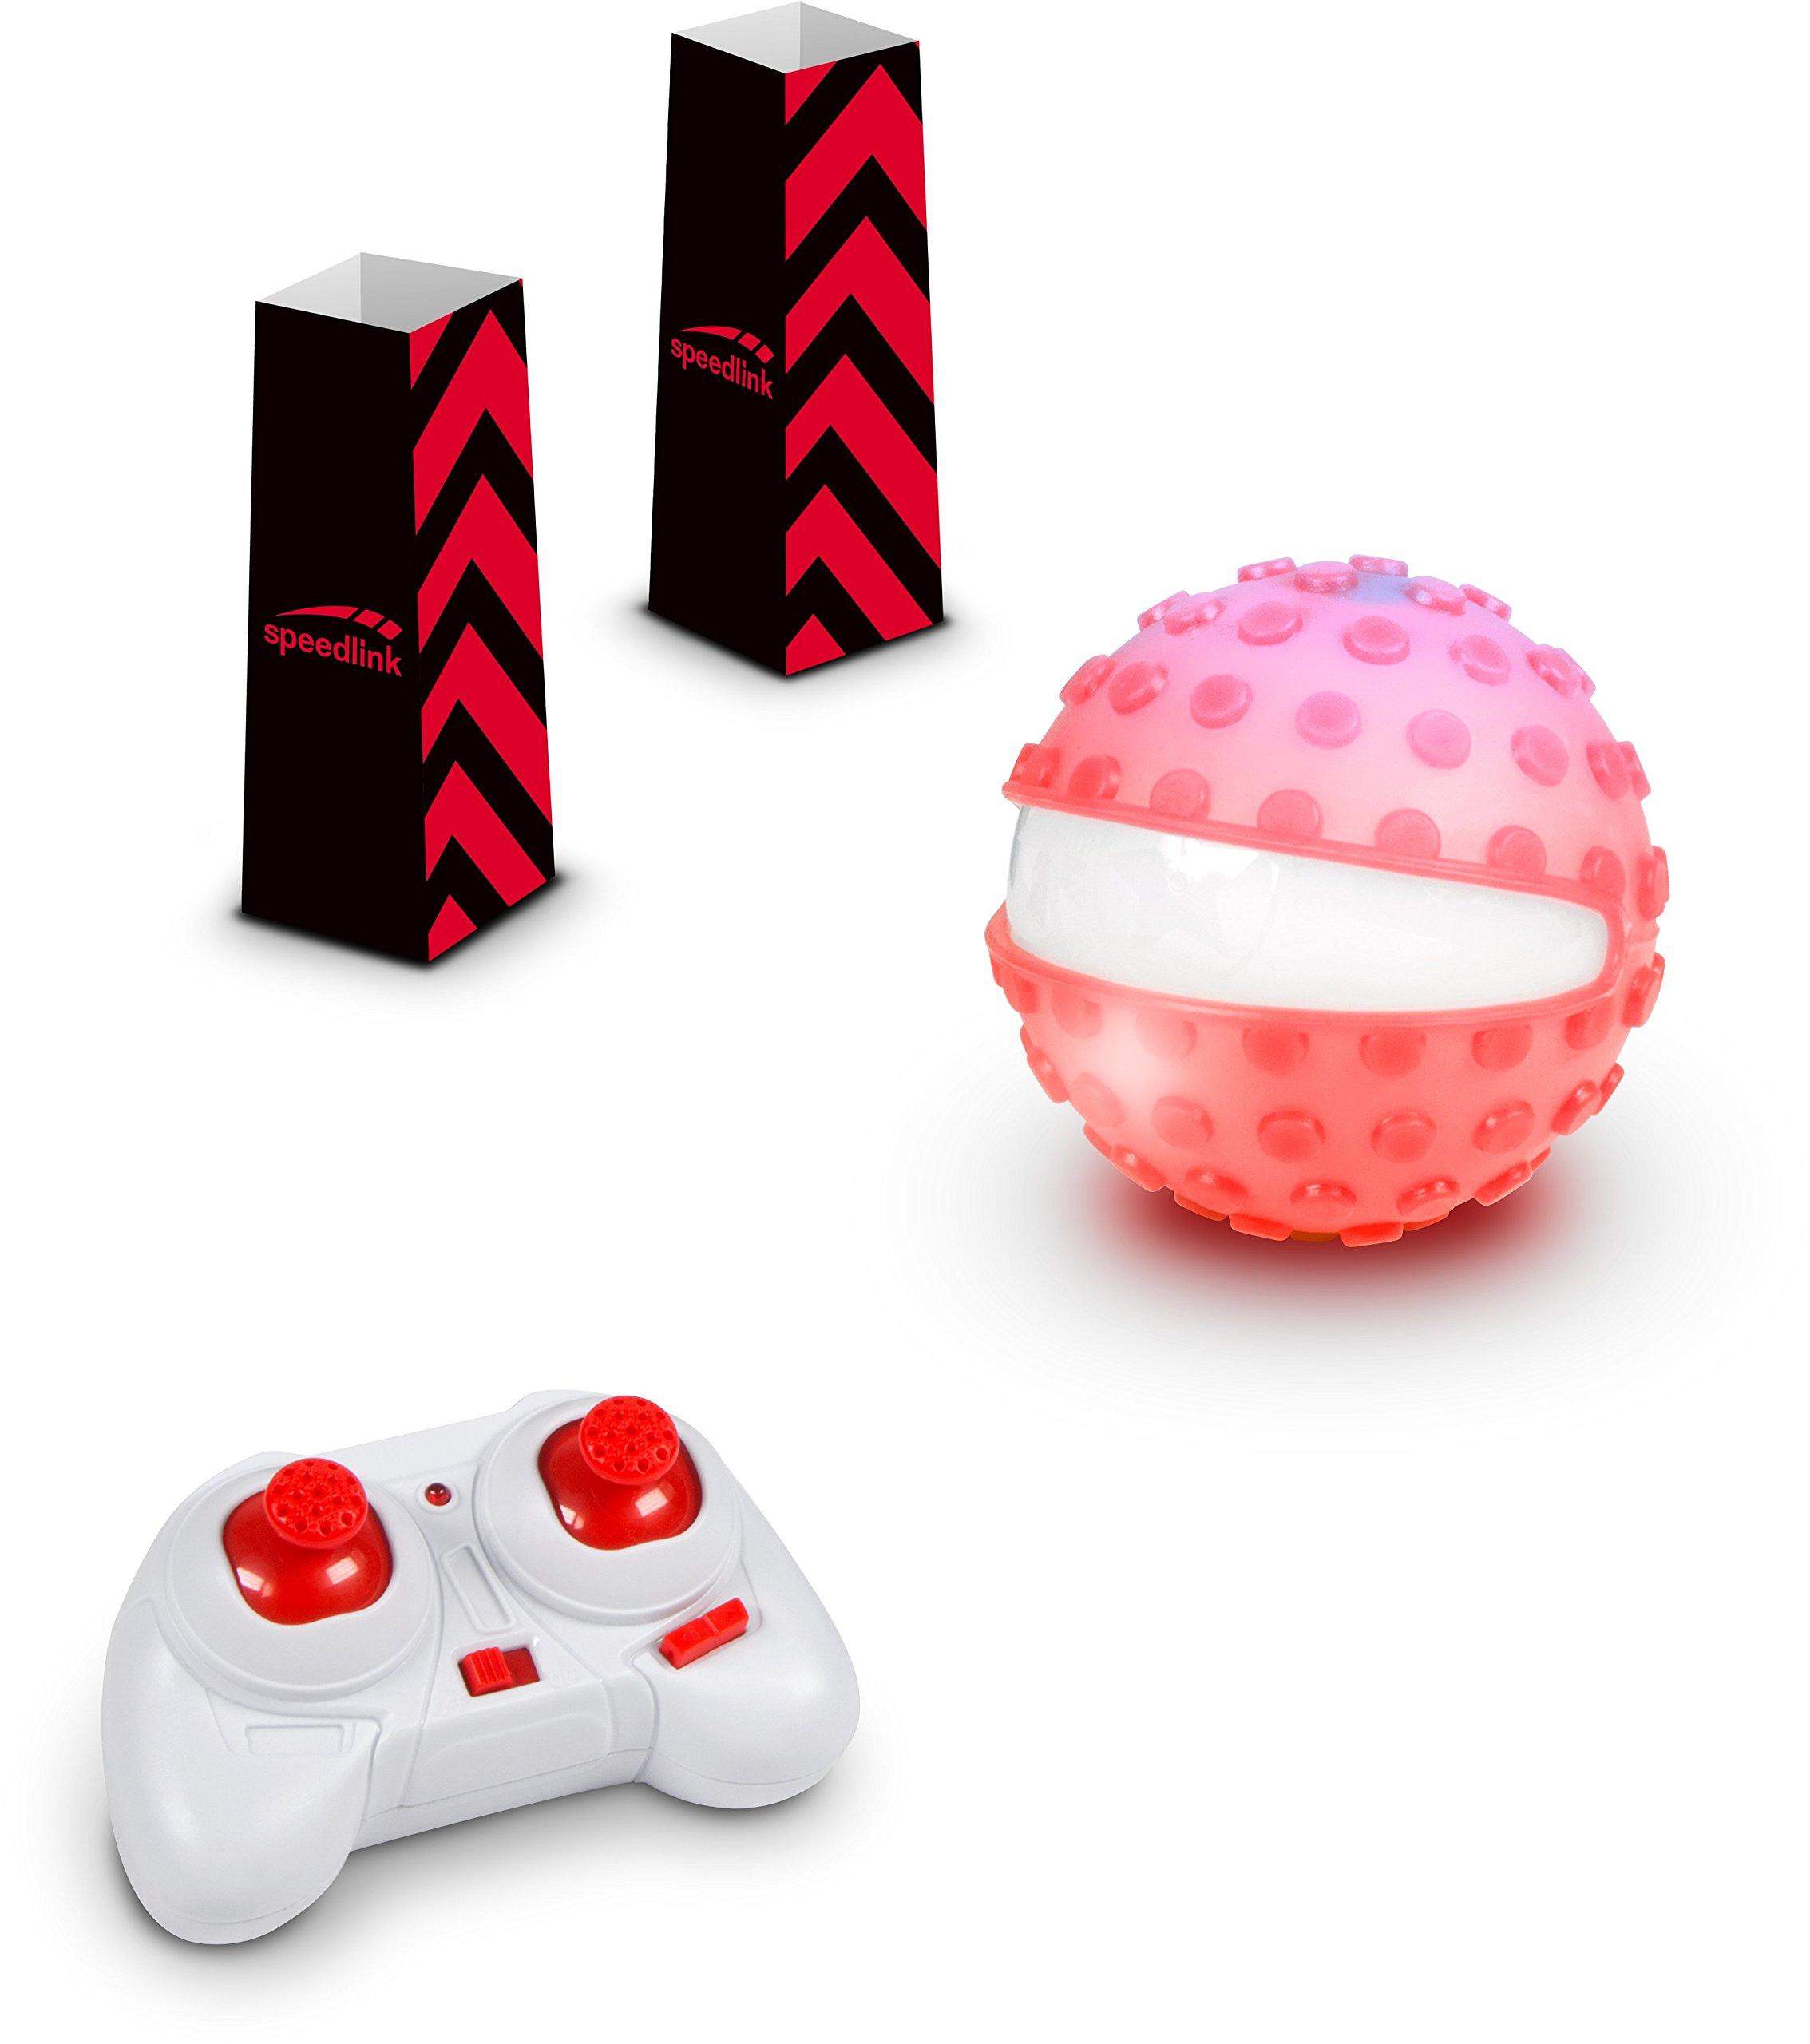 SPEEDLINK Ferngesteuerte Racing-Kugel - Racing Sphere Game Set RC (Silikon-Noppen-Hülle für Extra-Grip auf Sand und Erde…